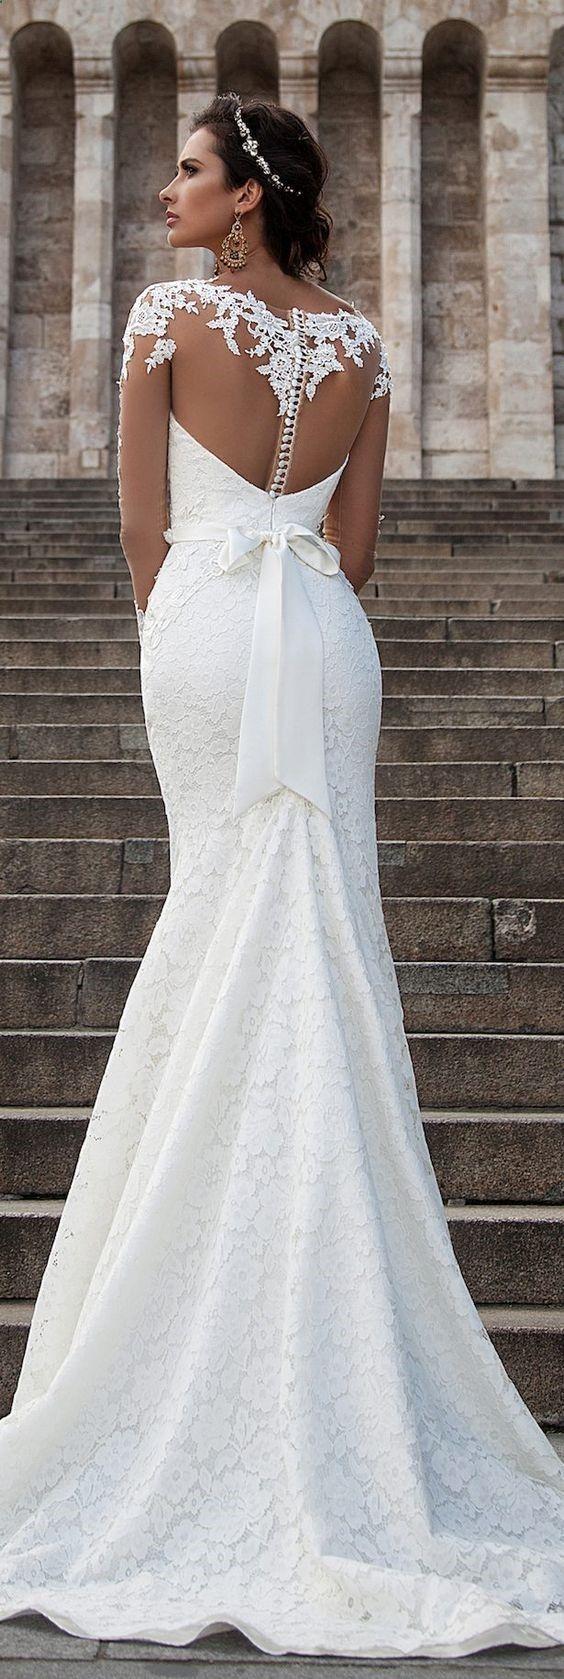 45 Casual Wedding Dresses Ideas for 2019 Weddings